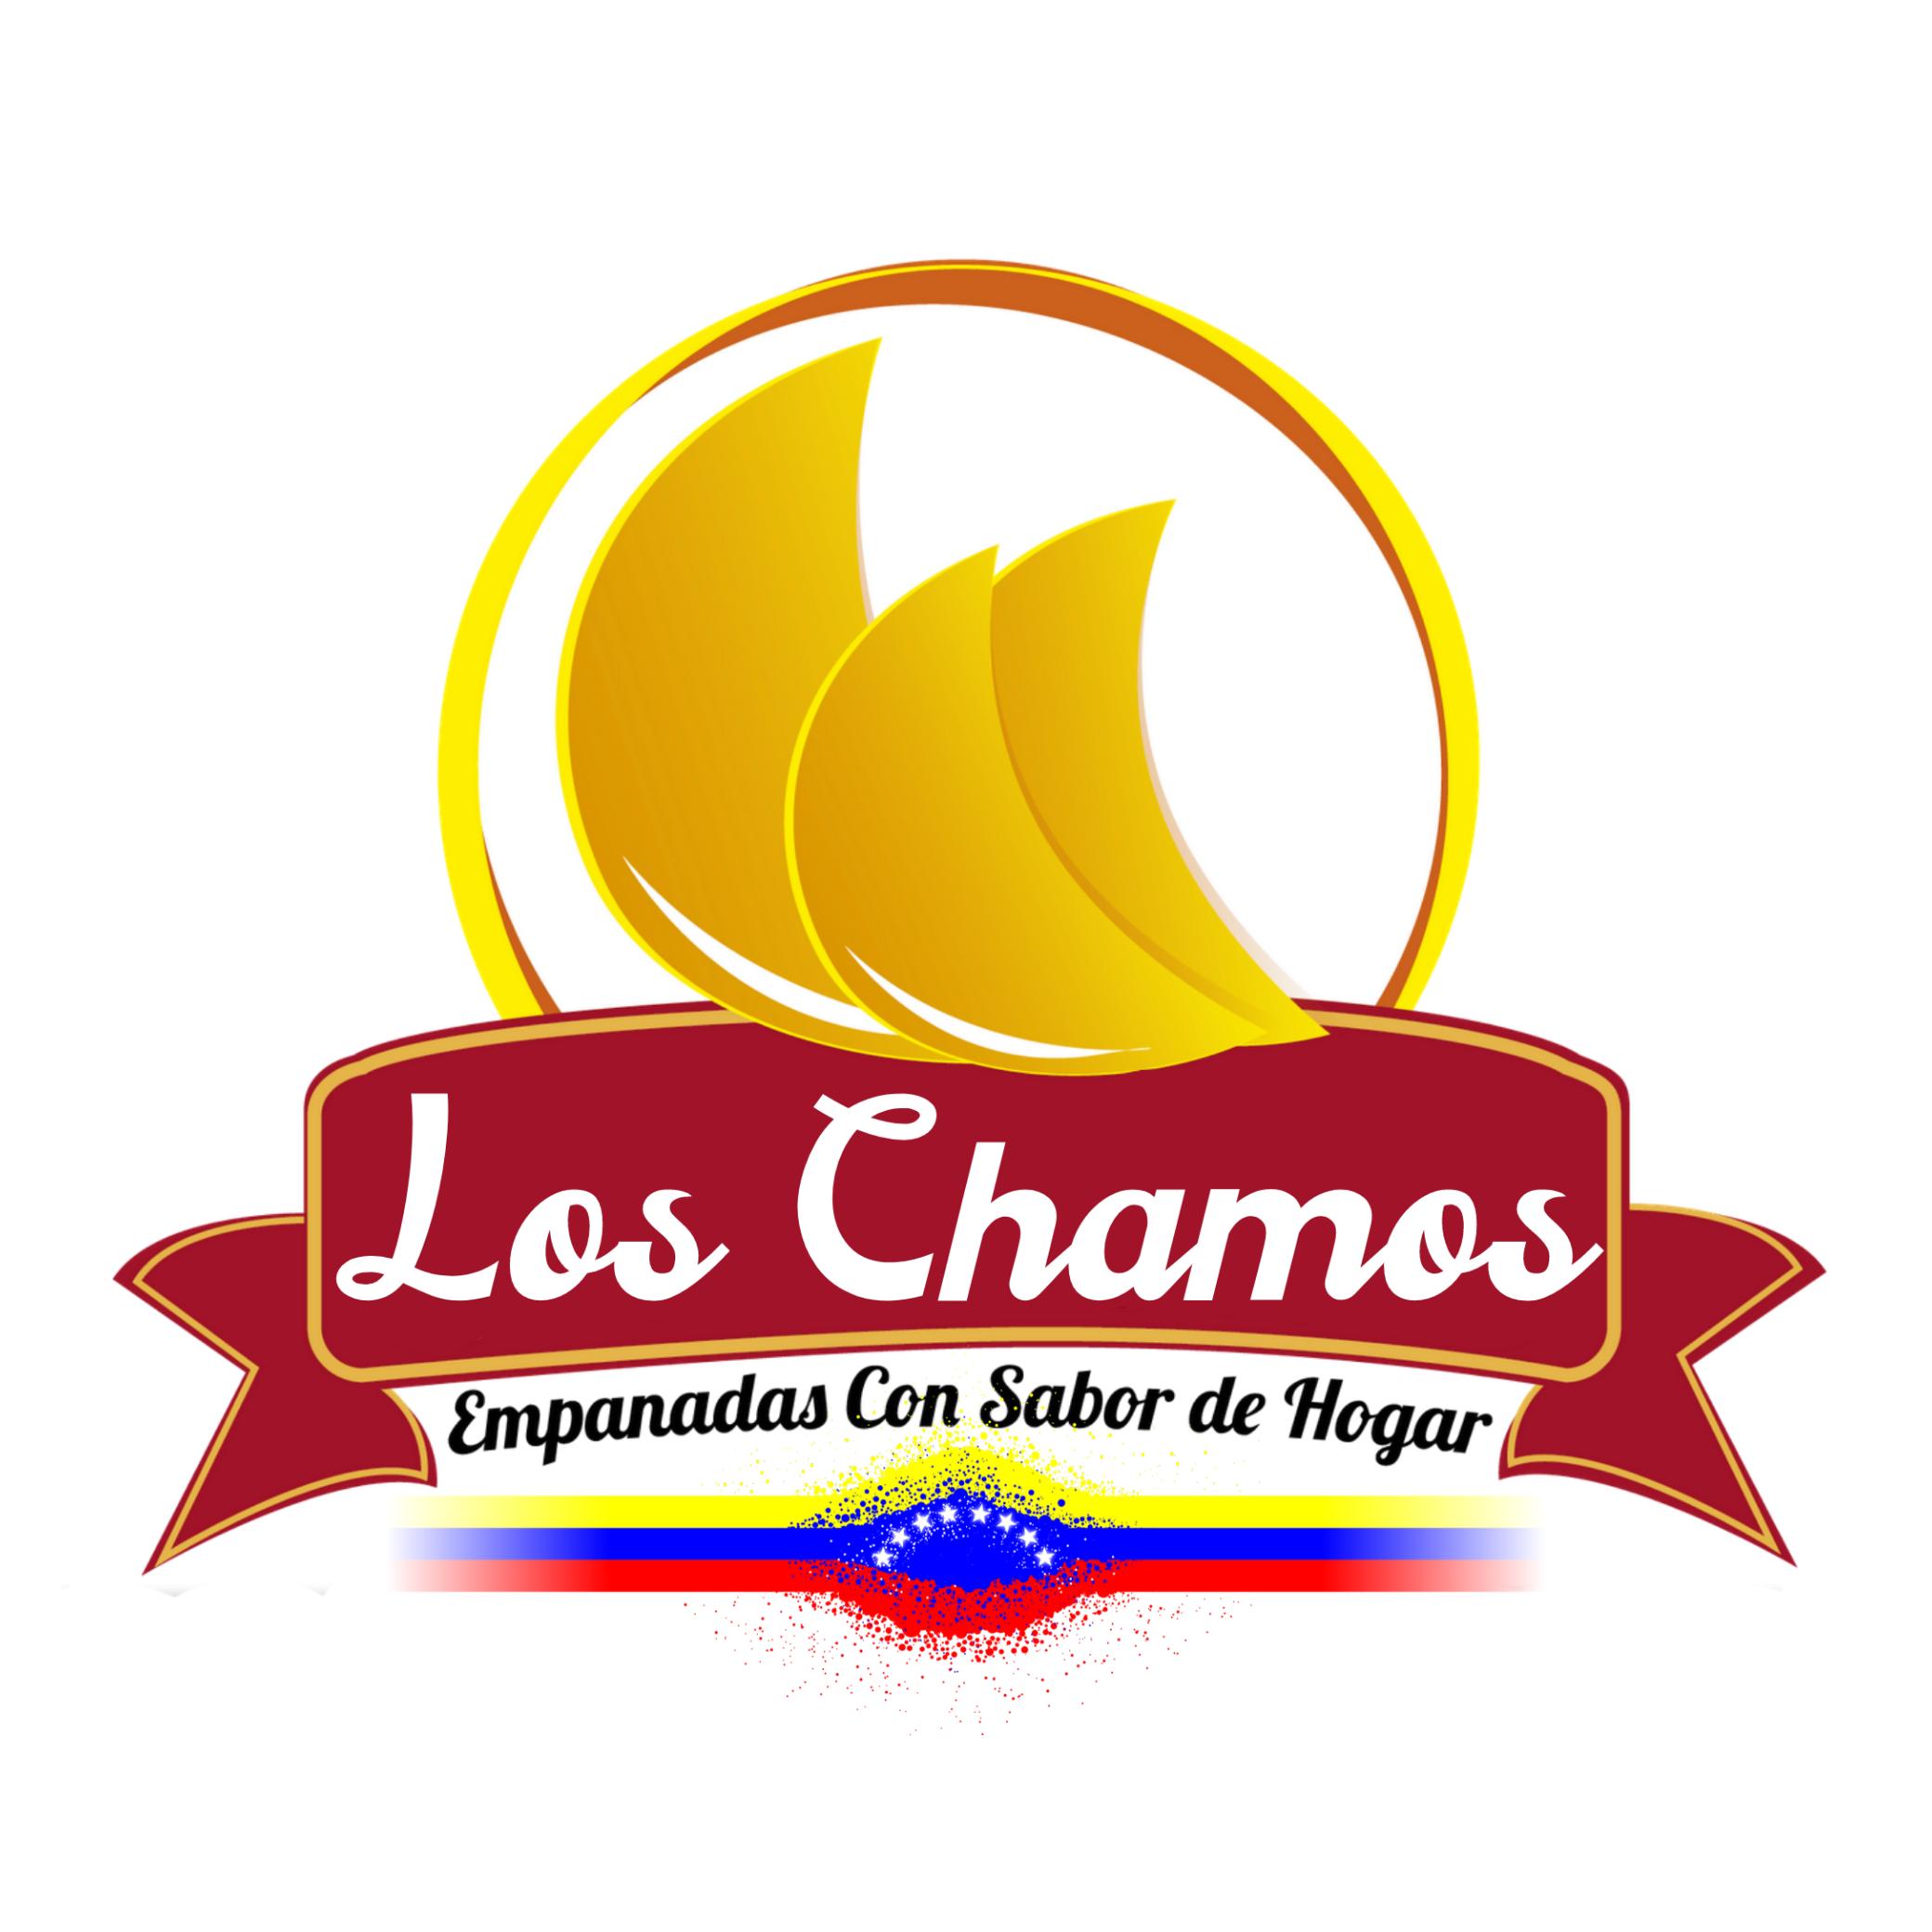 Los Chamos Empanadas Logo